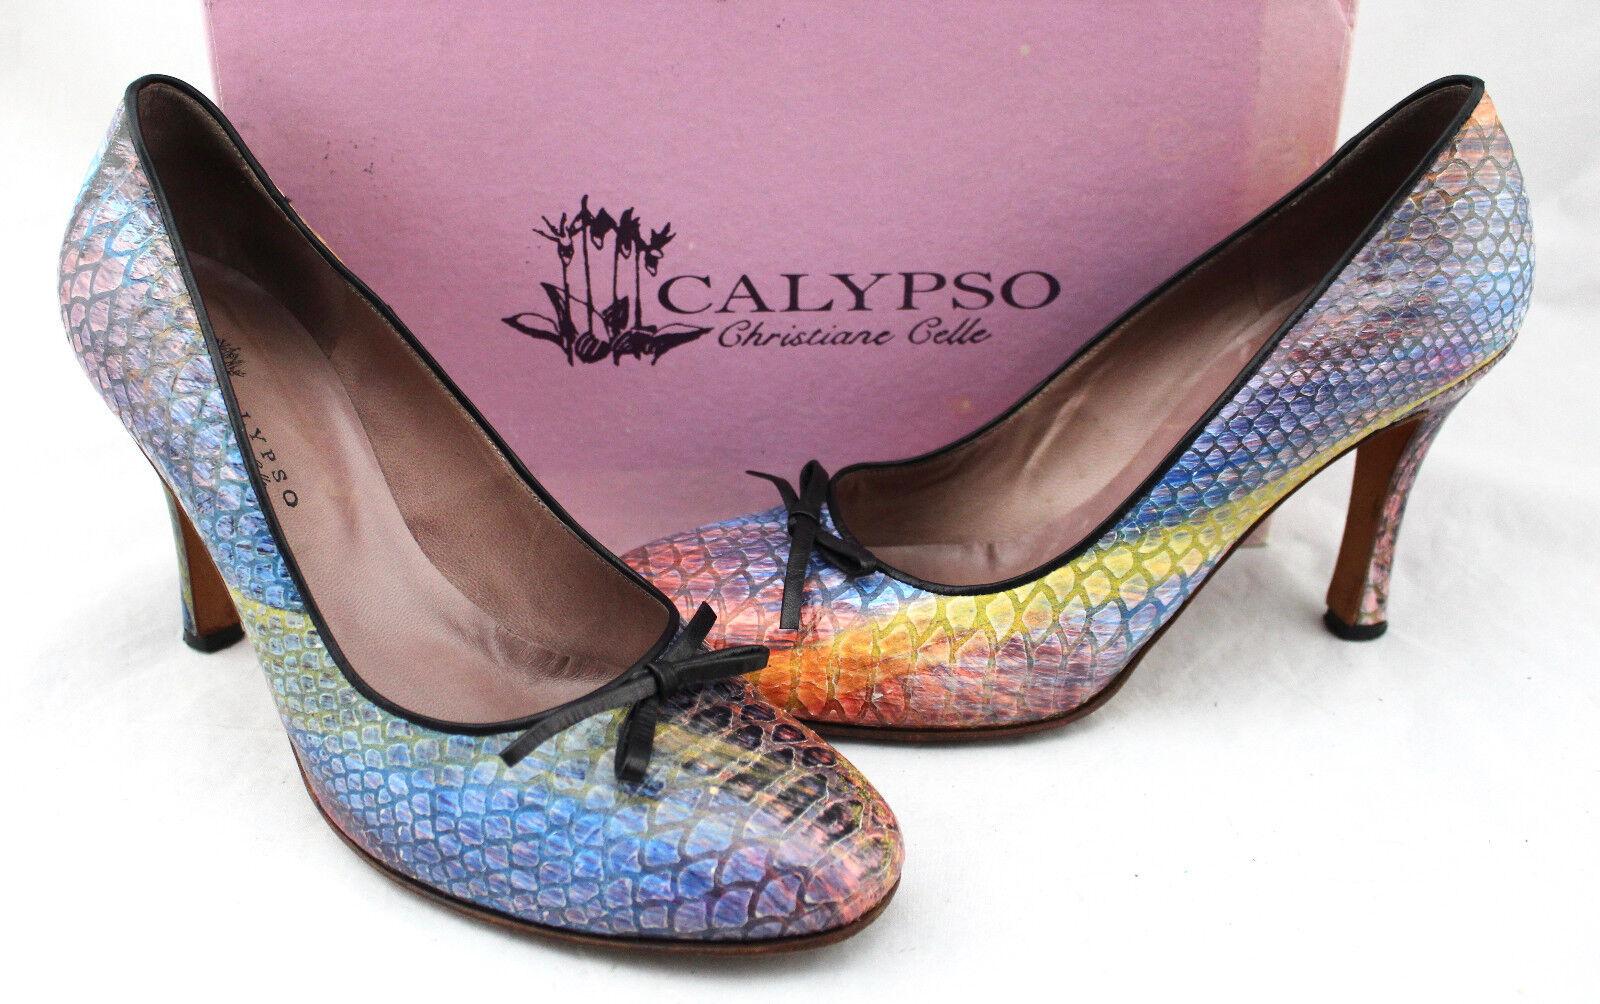 195 Calypso Christiane Celle Rainbow Snakeskin Leather Bow Bow Bow Pumps Heels 41 10.5 866e0d